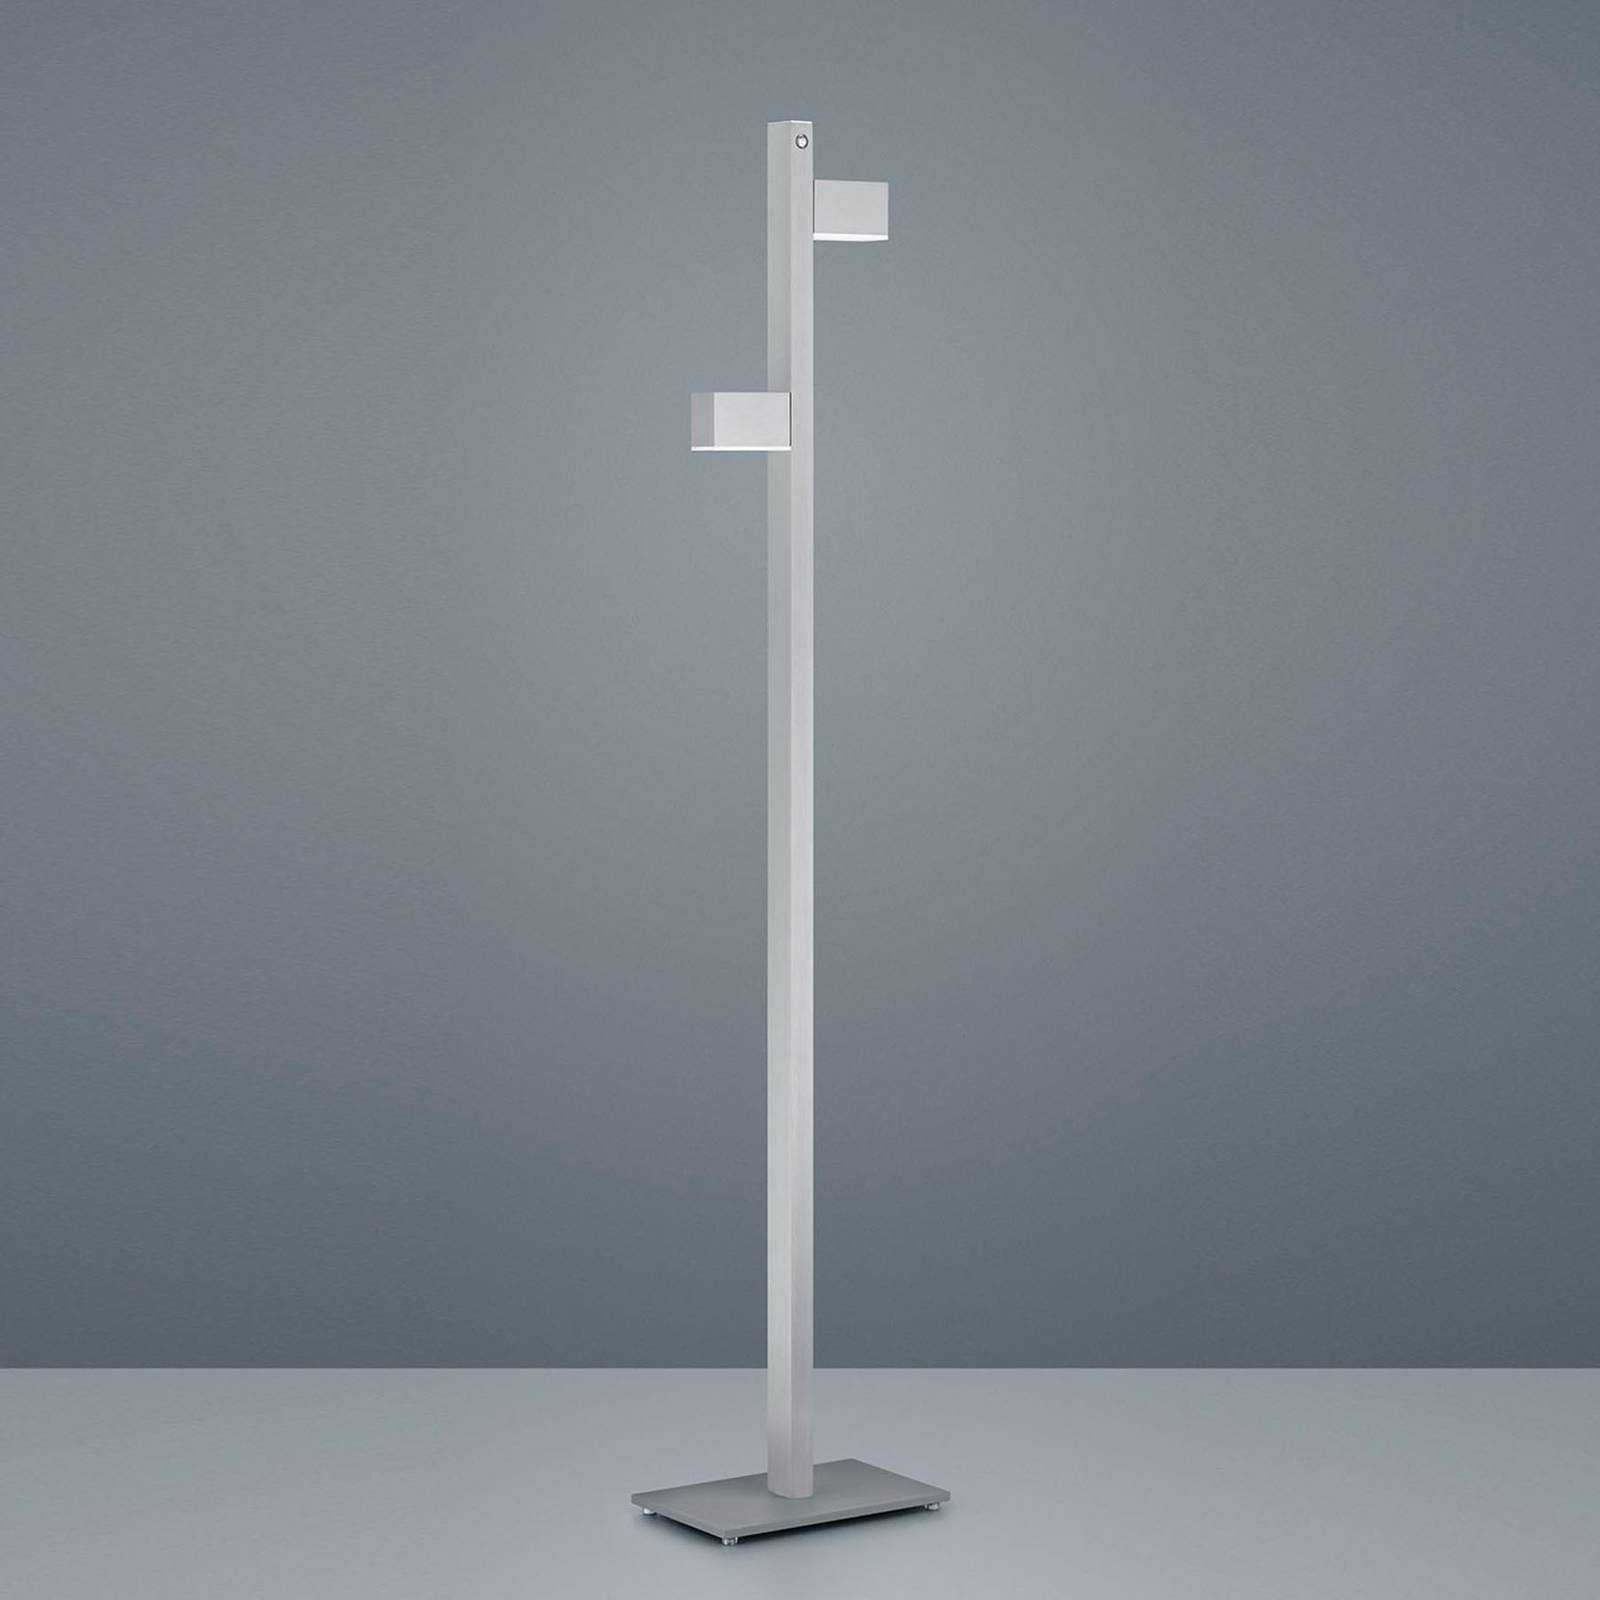 Helestra Arta LED-gulvlampe, nikkel matt/krom